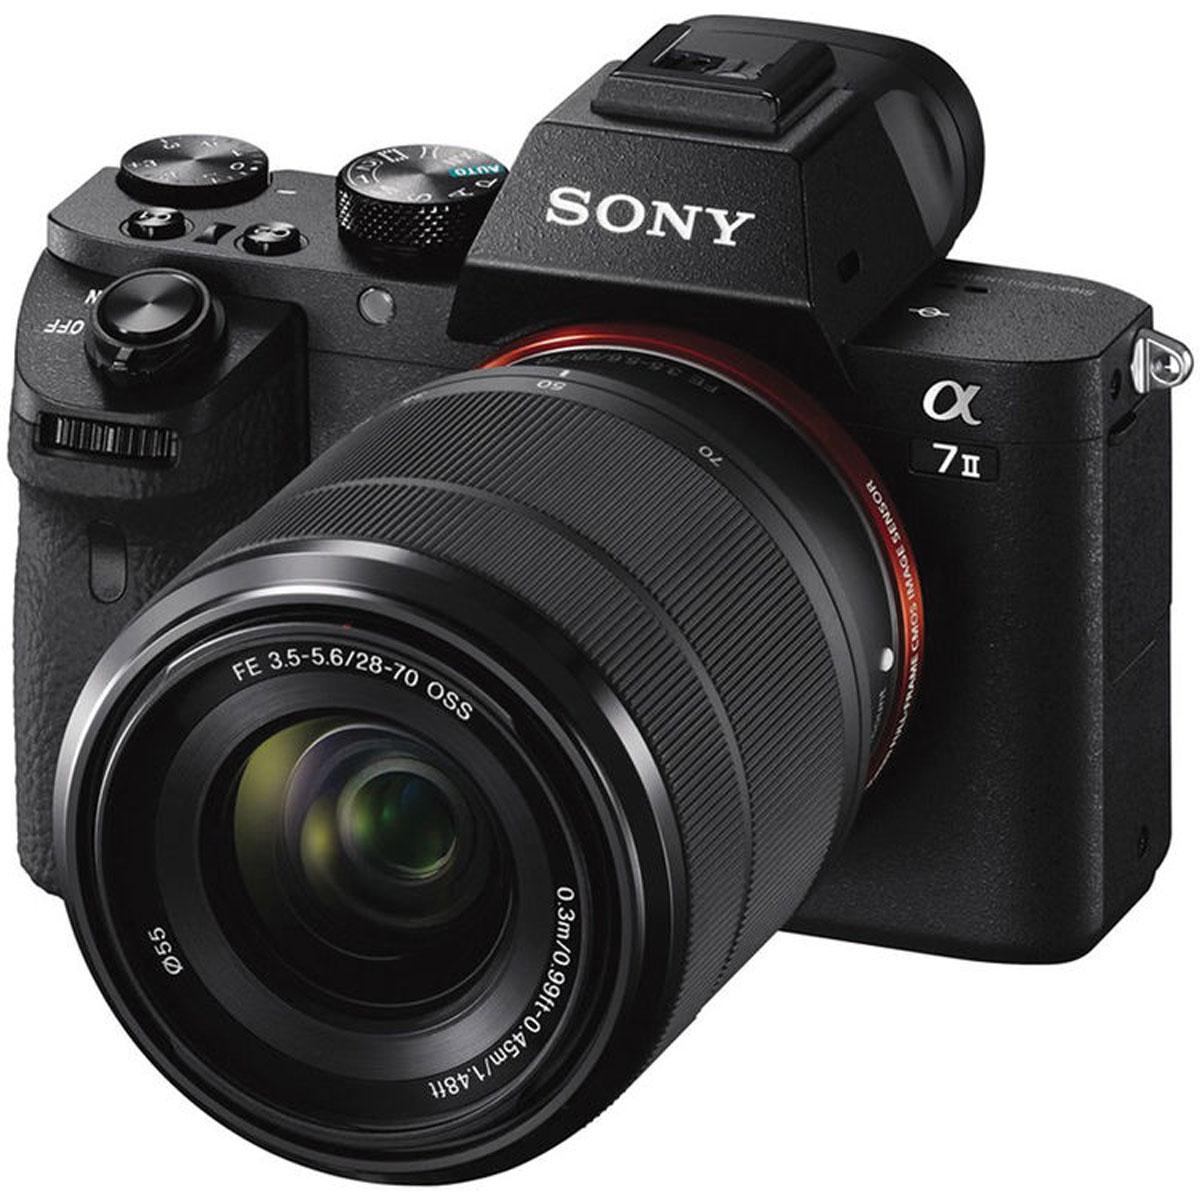 Sony Alpha A7 II (M2) Kit 28-70mm, Black цифровая фотокамера - Цифровые фотоаппараты